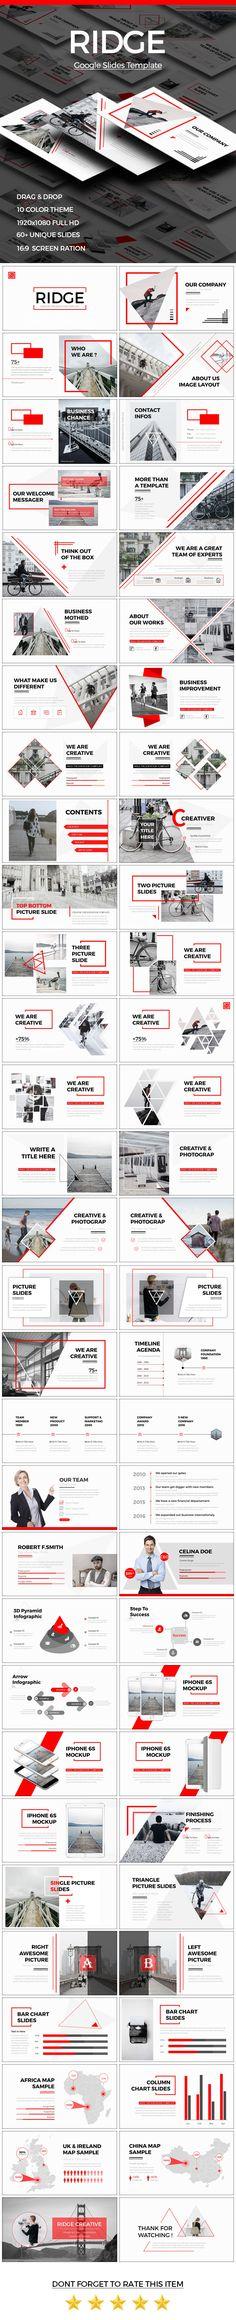 RIDGE - CREATIVE Google Slide Template - Google Slides Presentation Templates